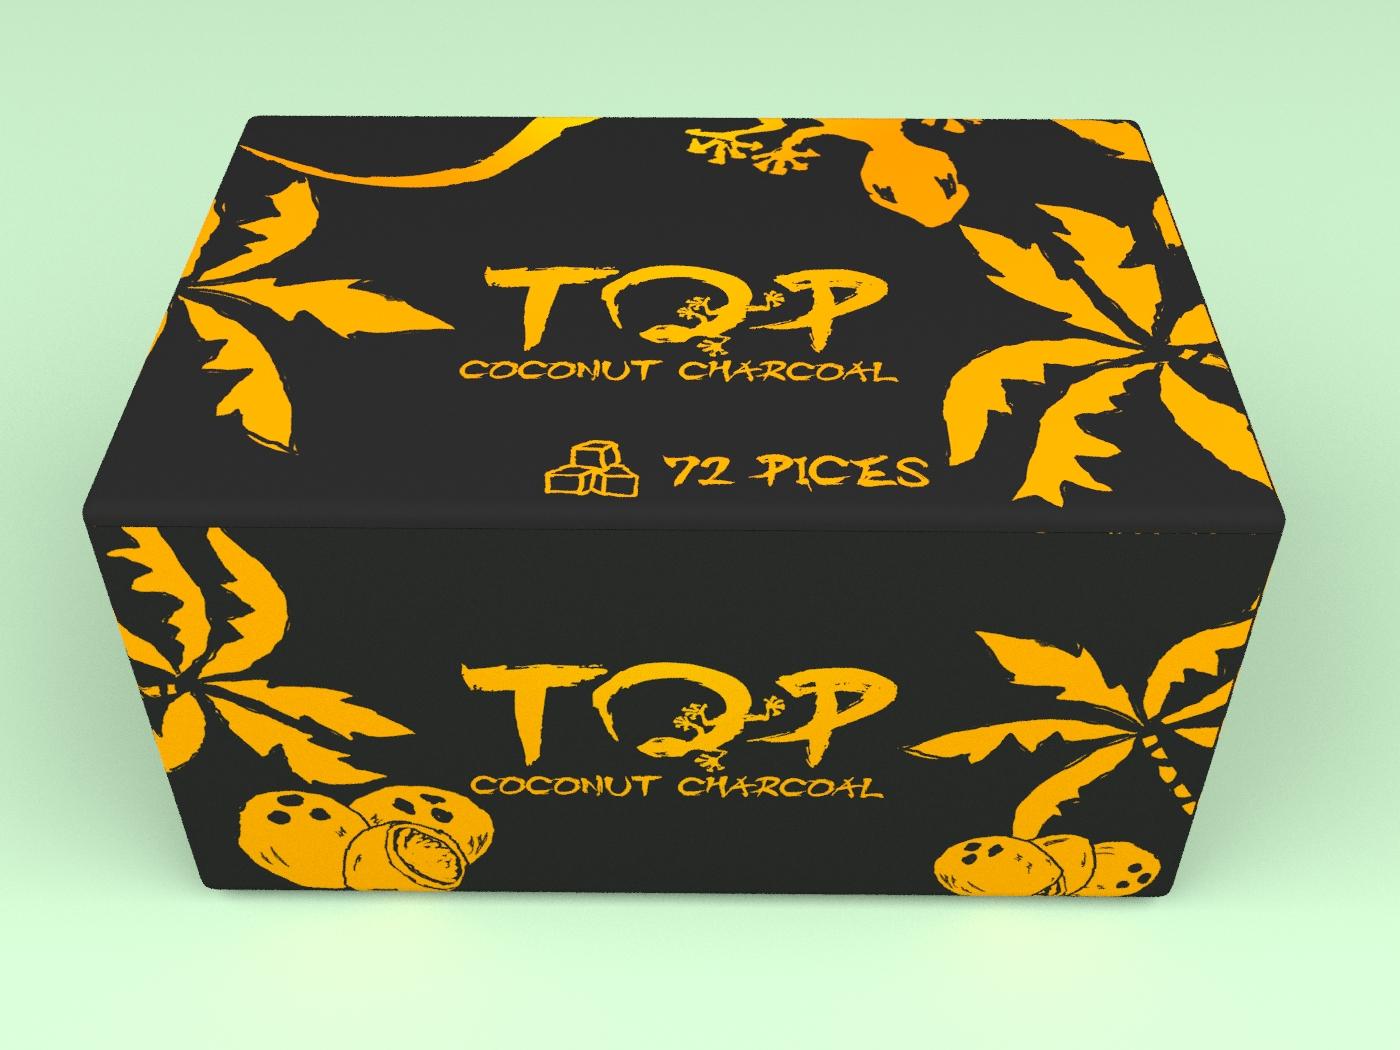 Разработка дизайна коробки, фирменного стиля, логотипа. фото f_8415c60254bbadfa.jpg